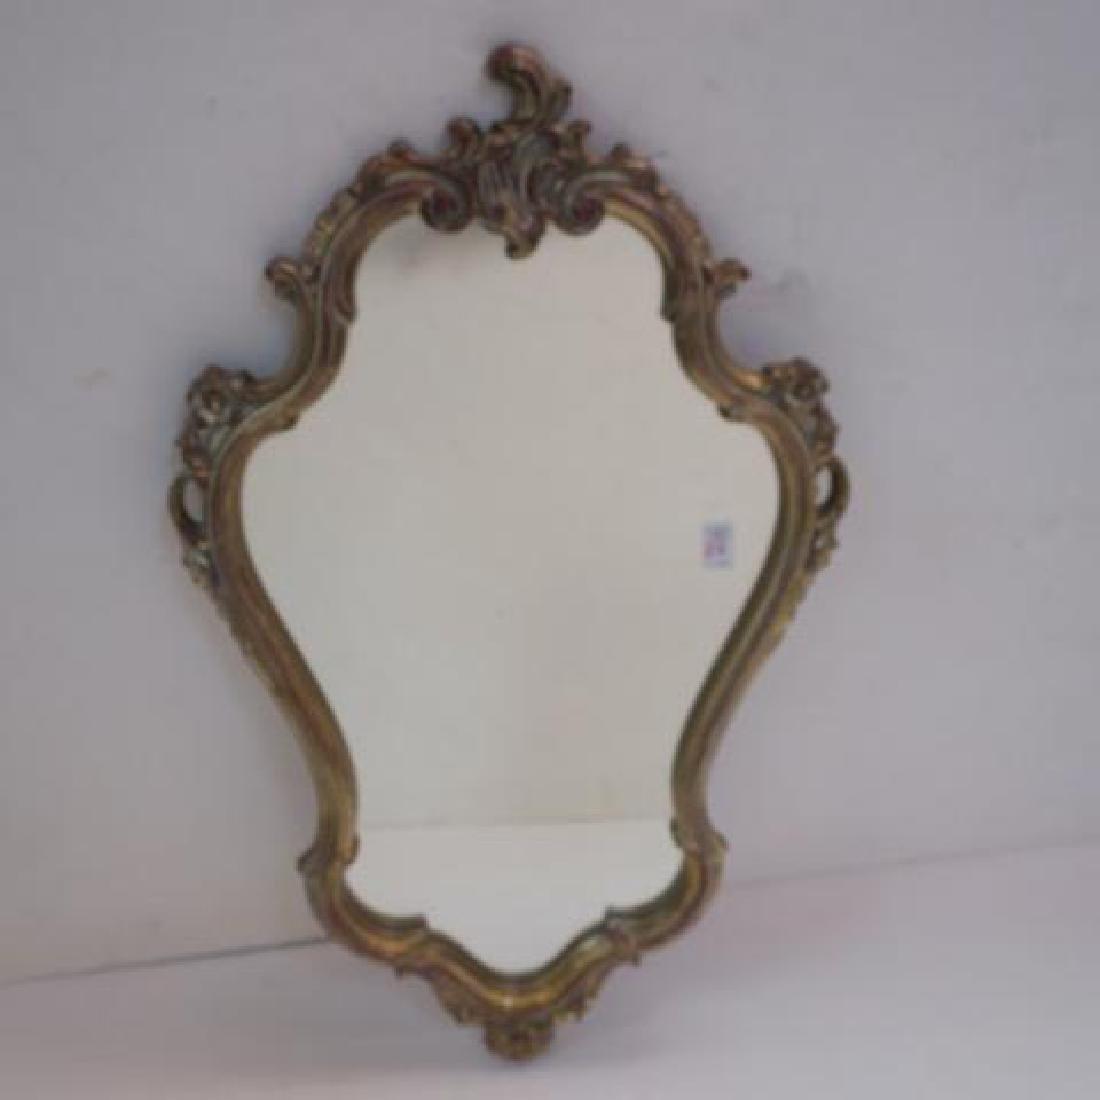 Shield Shaped Gilt Framed Plate Mirror: